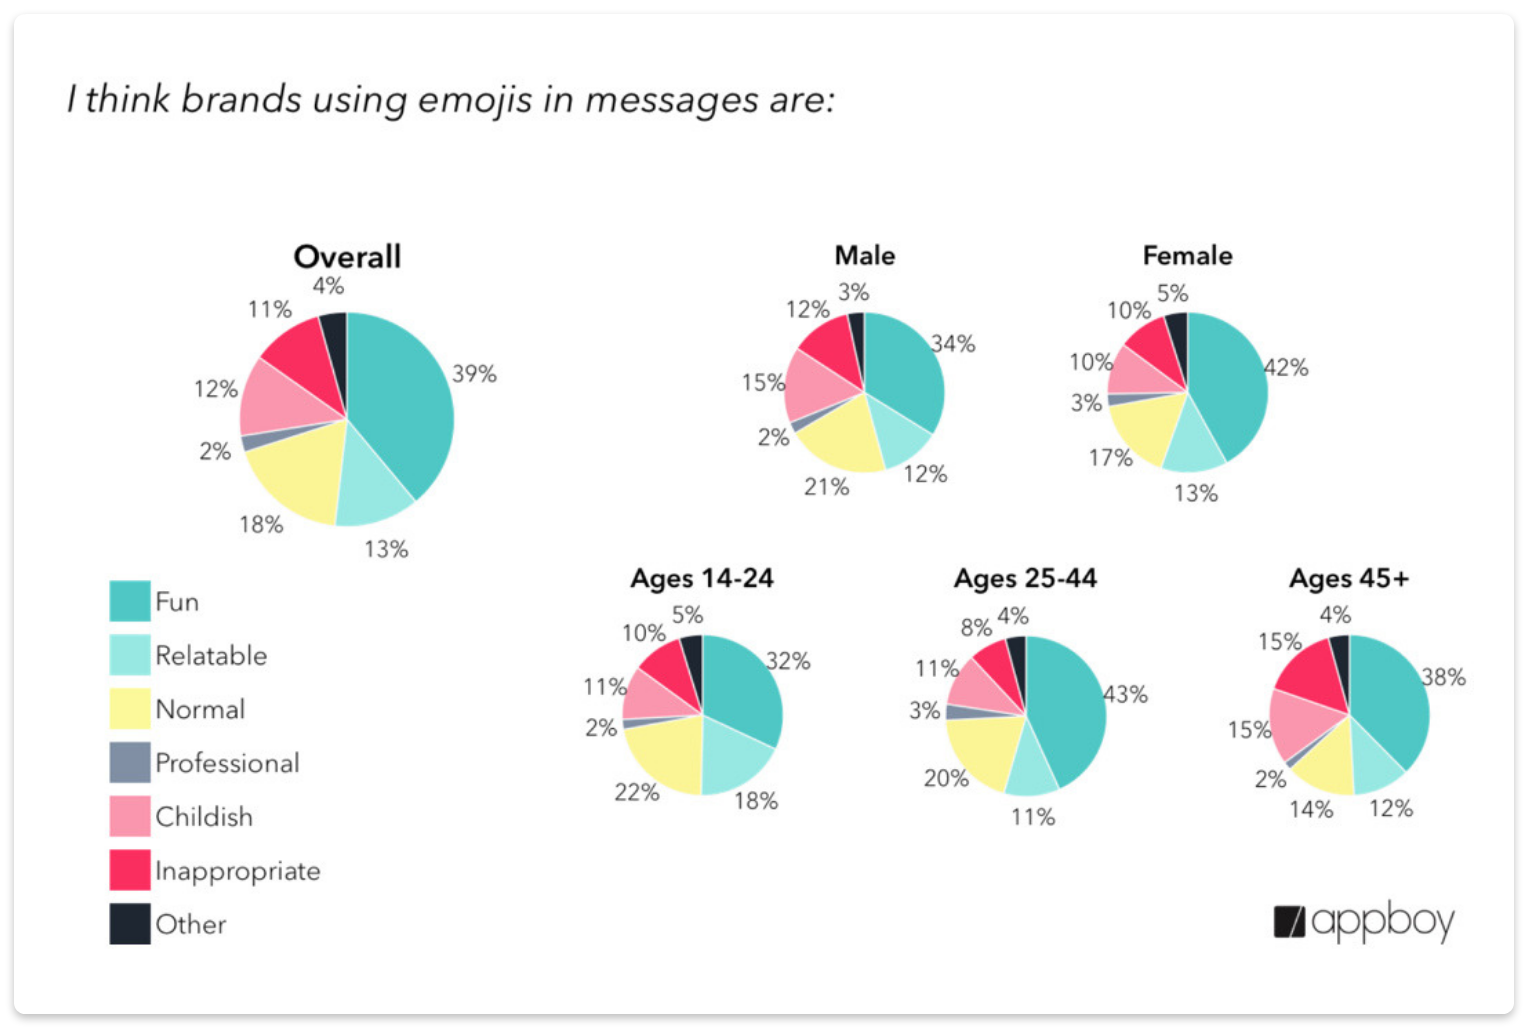 brands using emojis